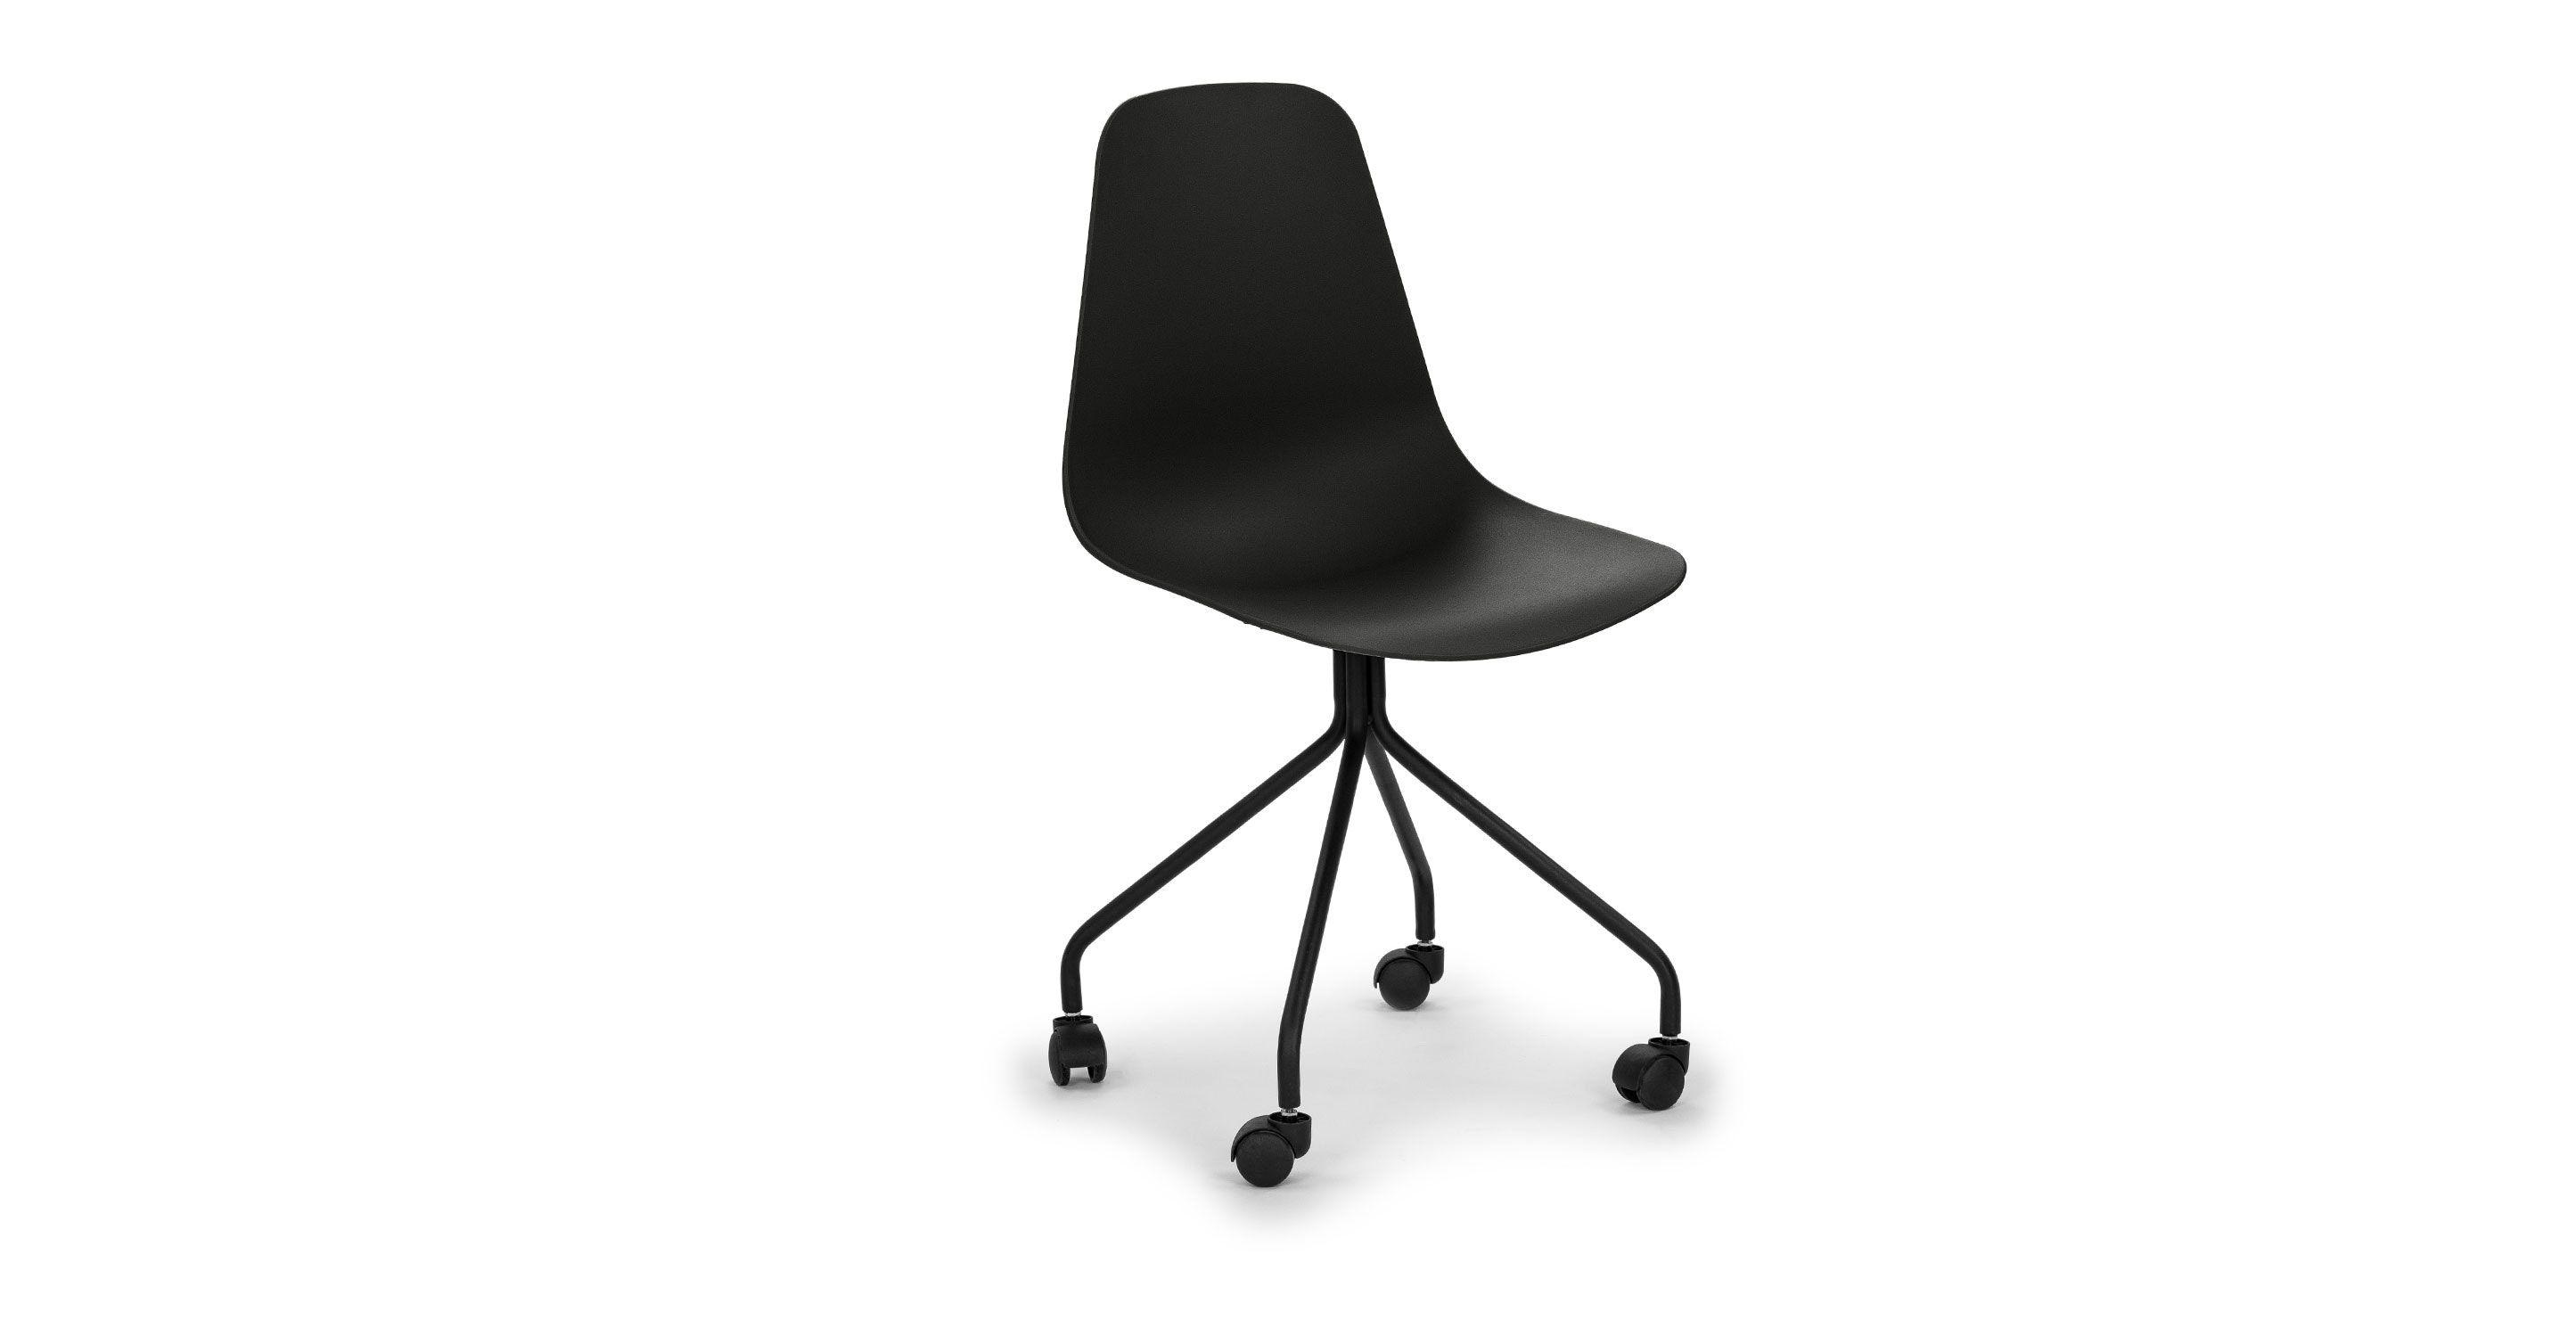 Svelti Pure Black Office Chair Chairs Article Modern Mid Century And Scandinavian Modern Office Chair Black Office Chair Mid Century Modern Office Chair